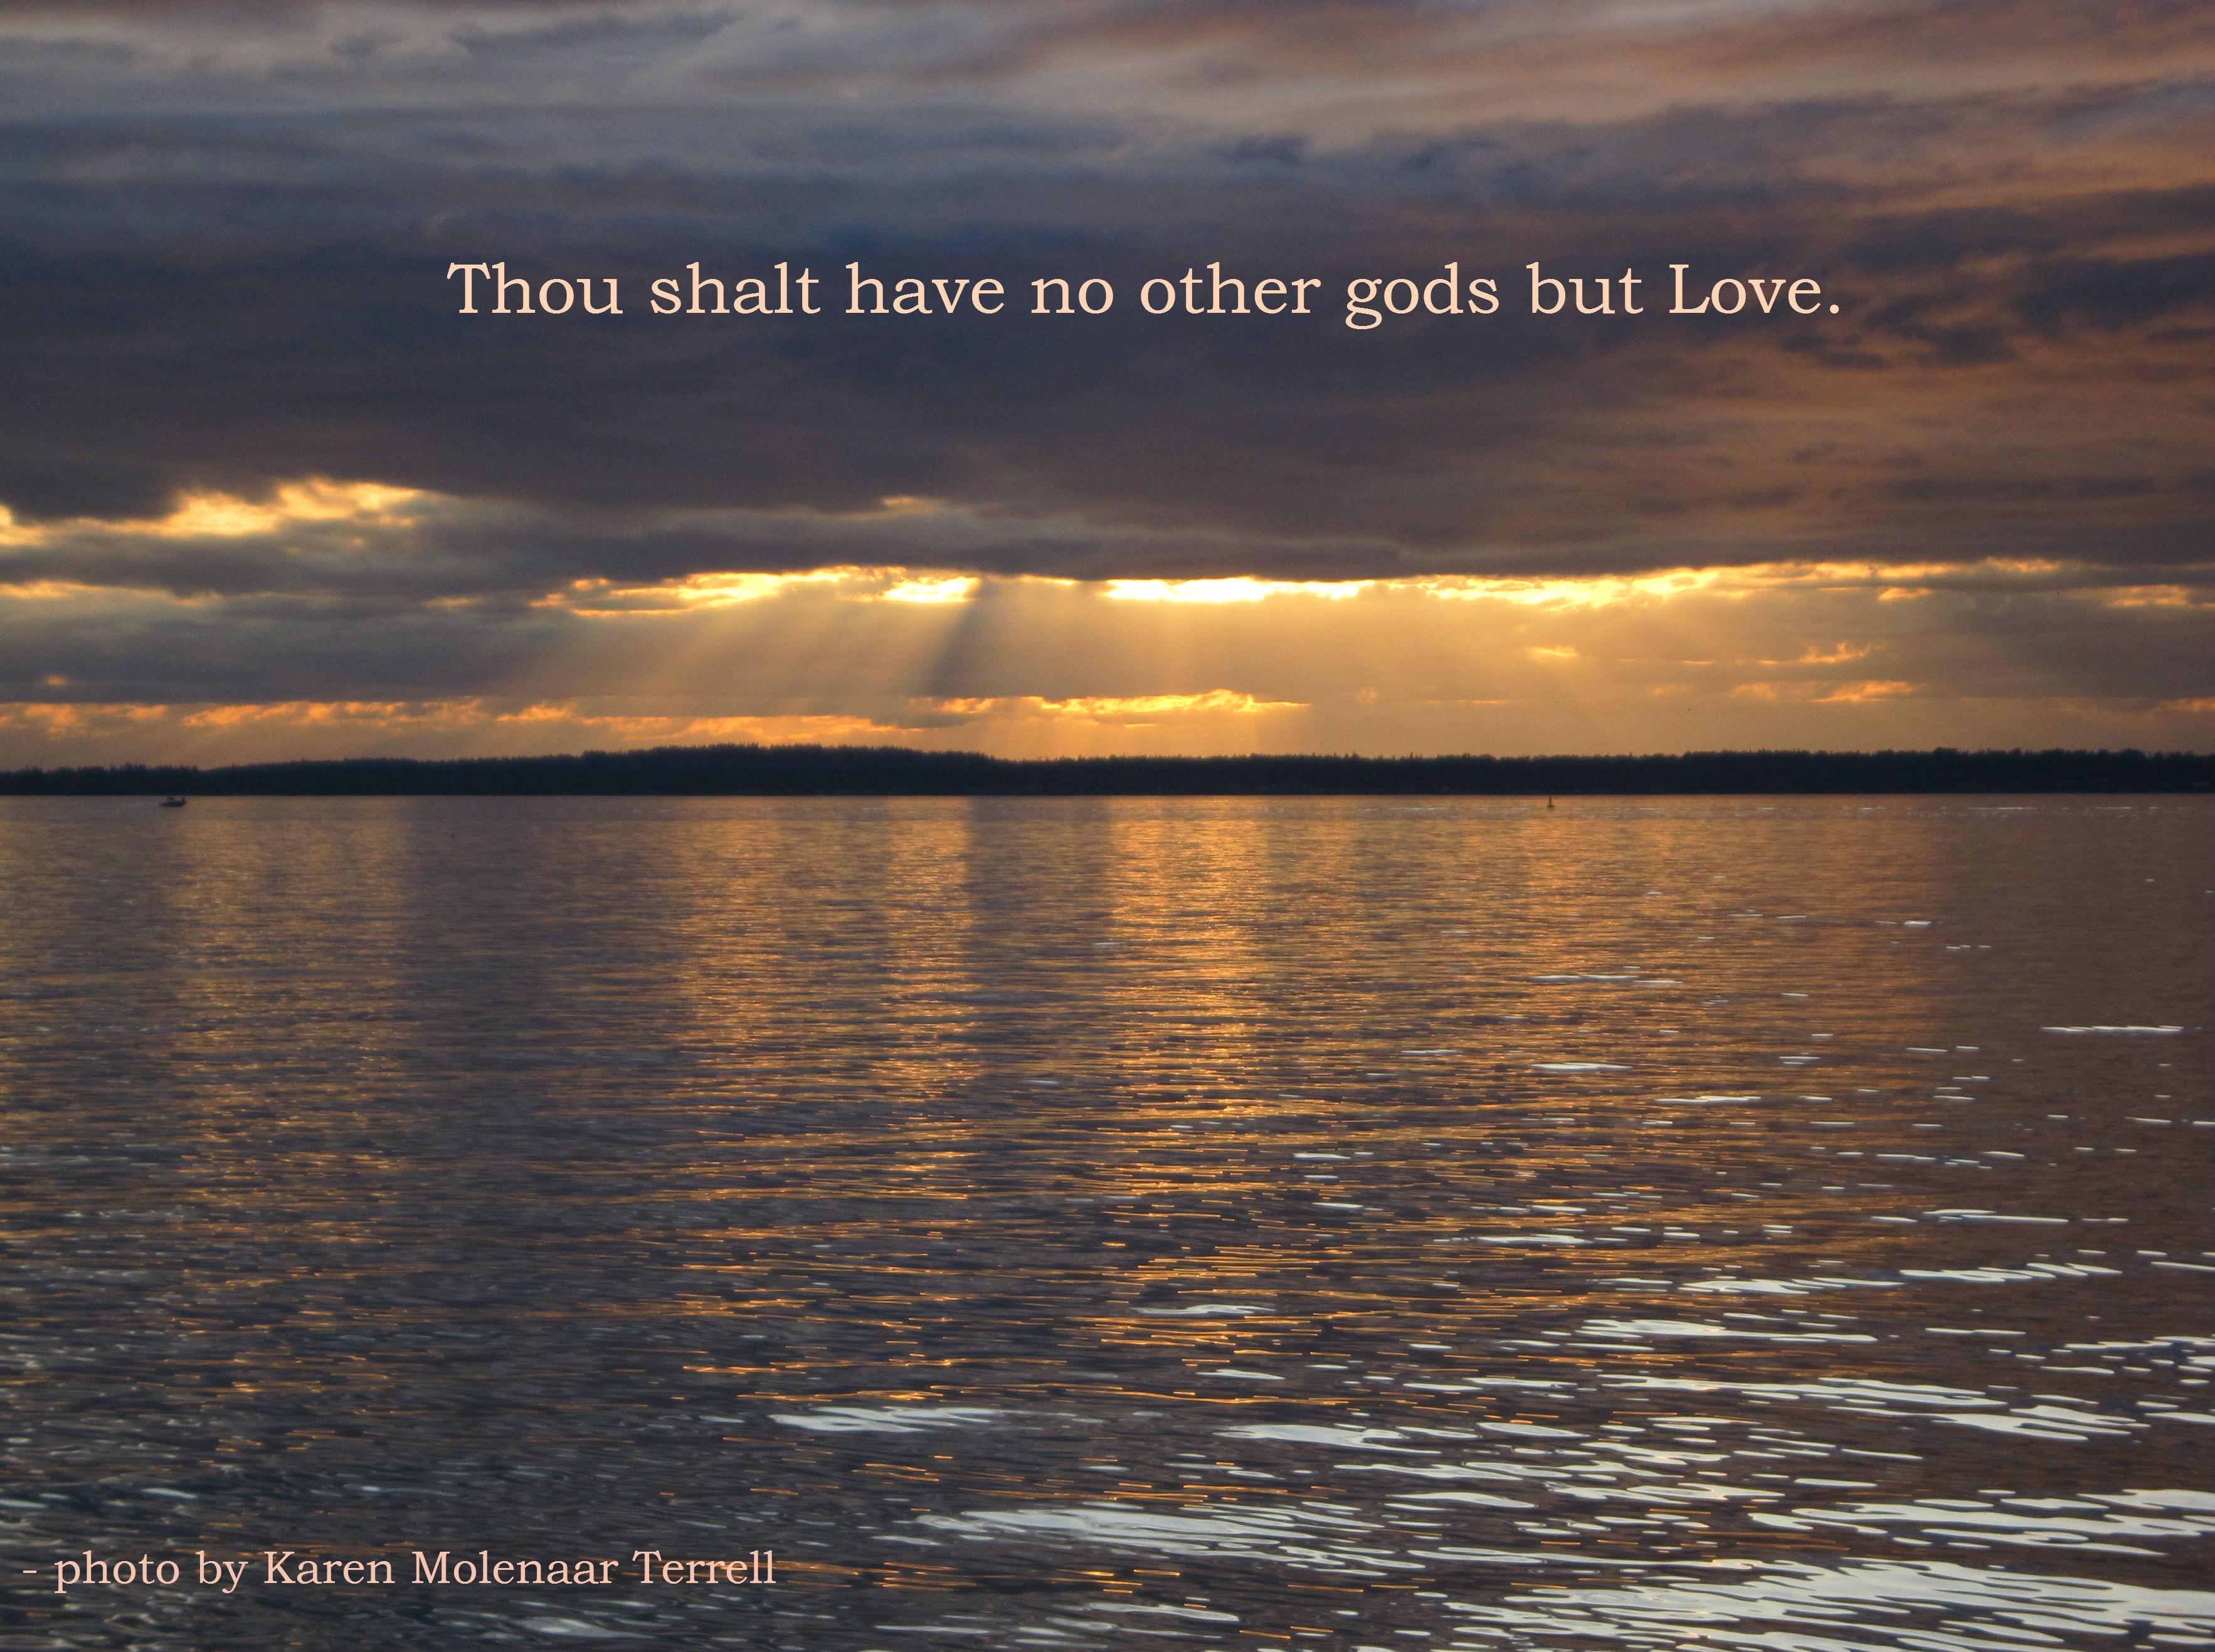 Thou shalt have no other gods but Love